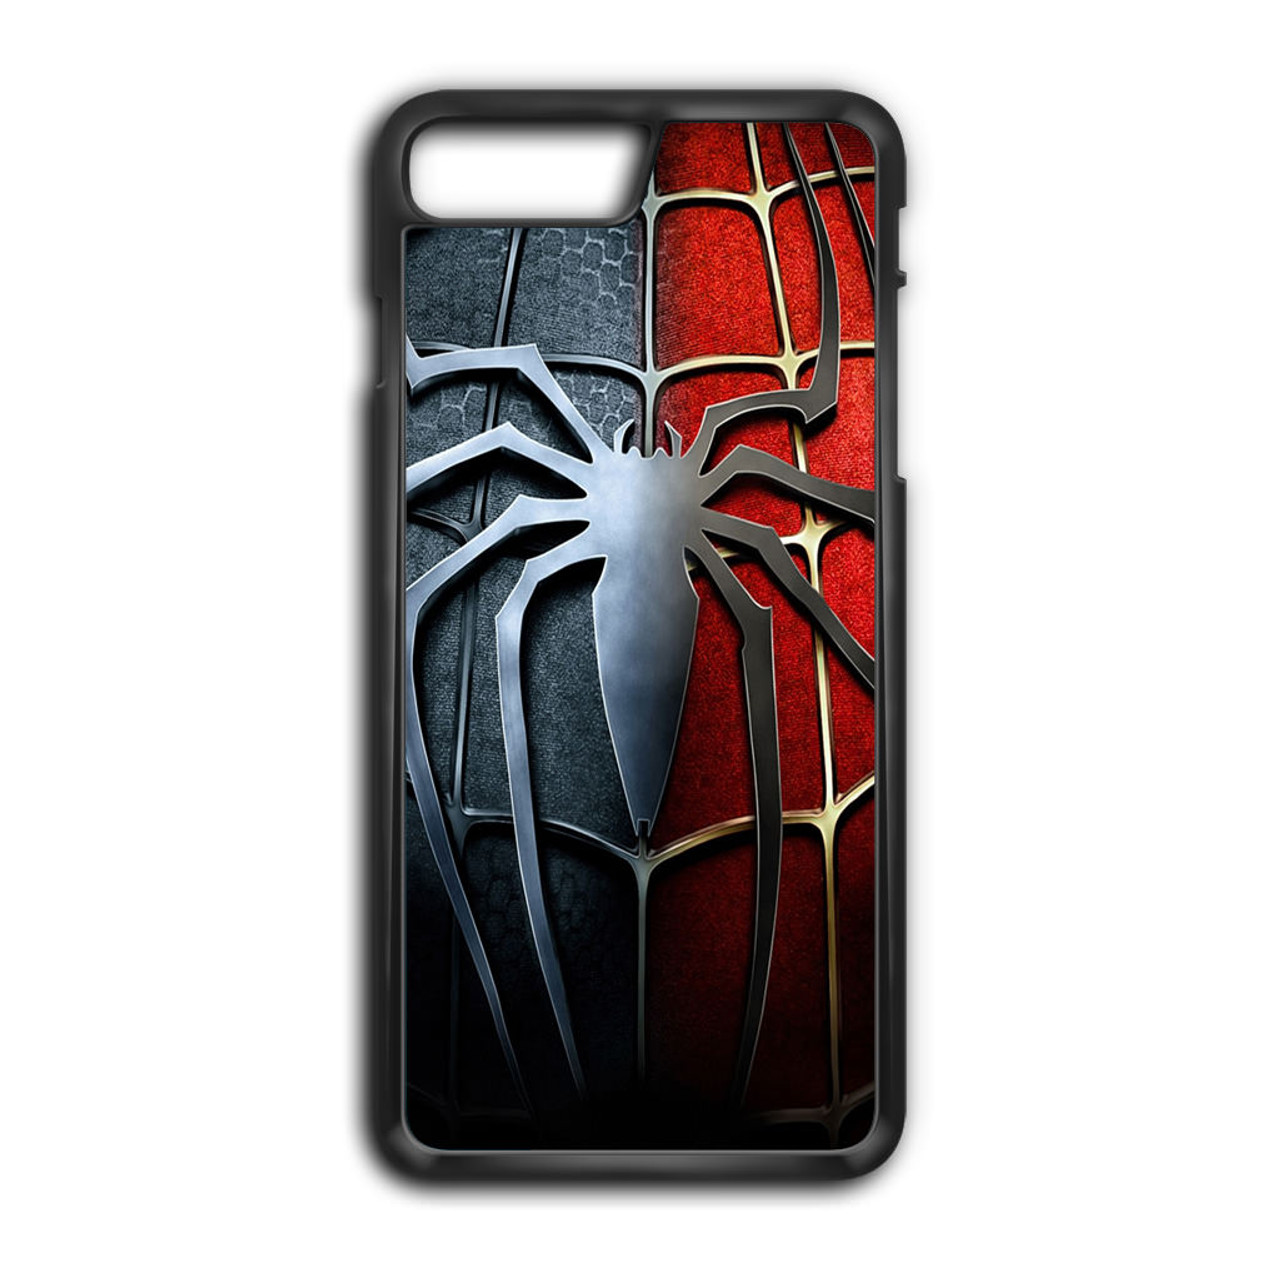 iphone 7 case spiderman